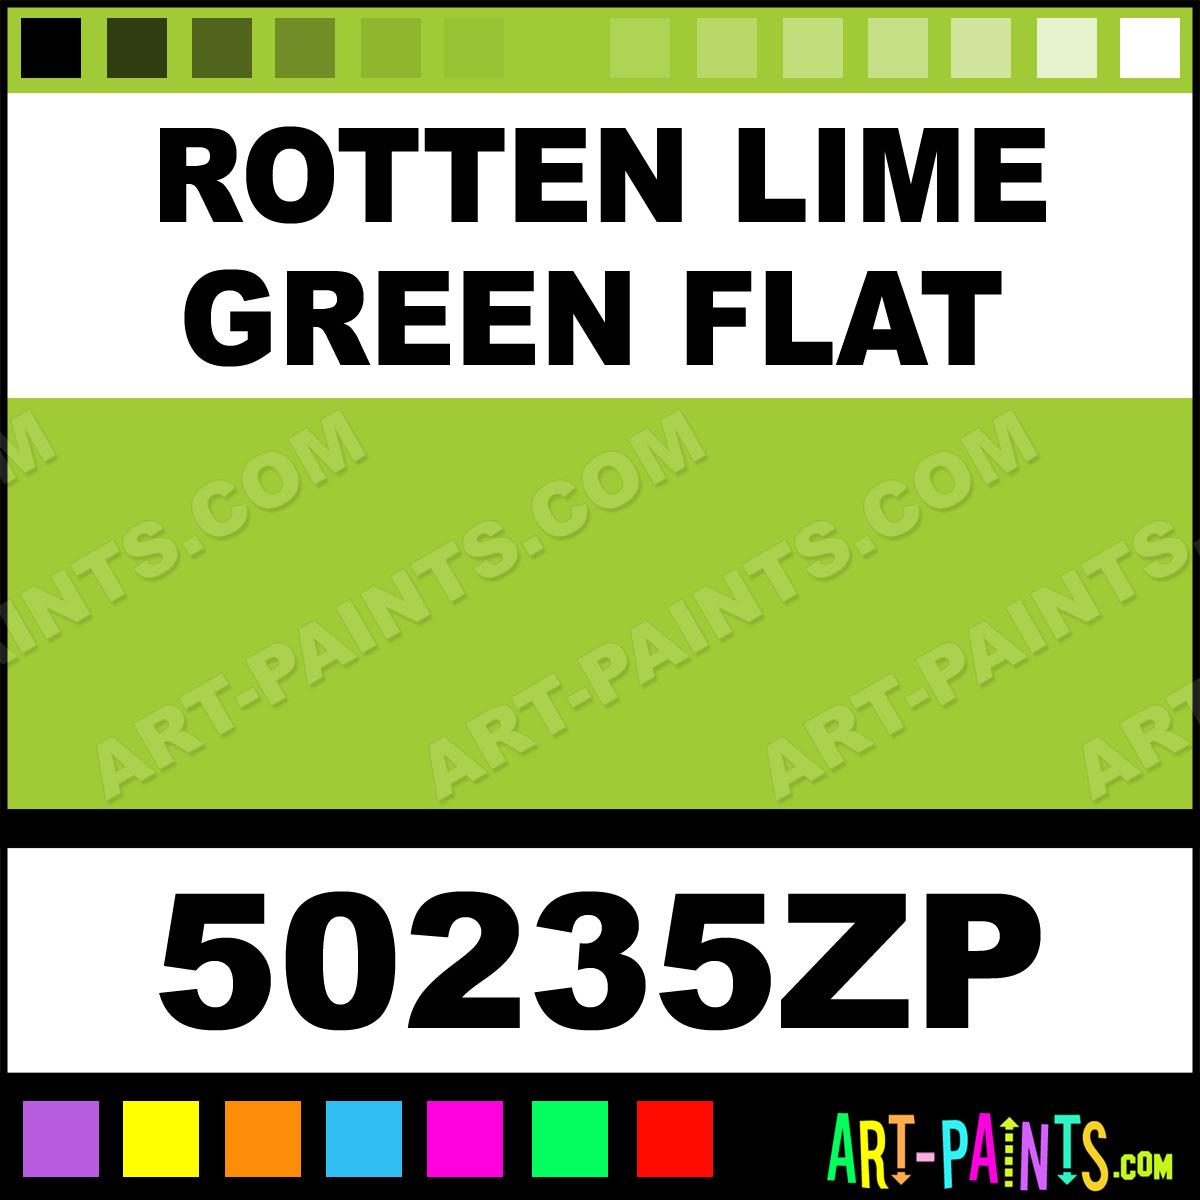 Rotten Lime Green Flat Factory Match Spray Paints Aerosol Decorative Paints 50235zp Rotten